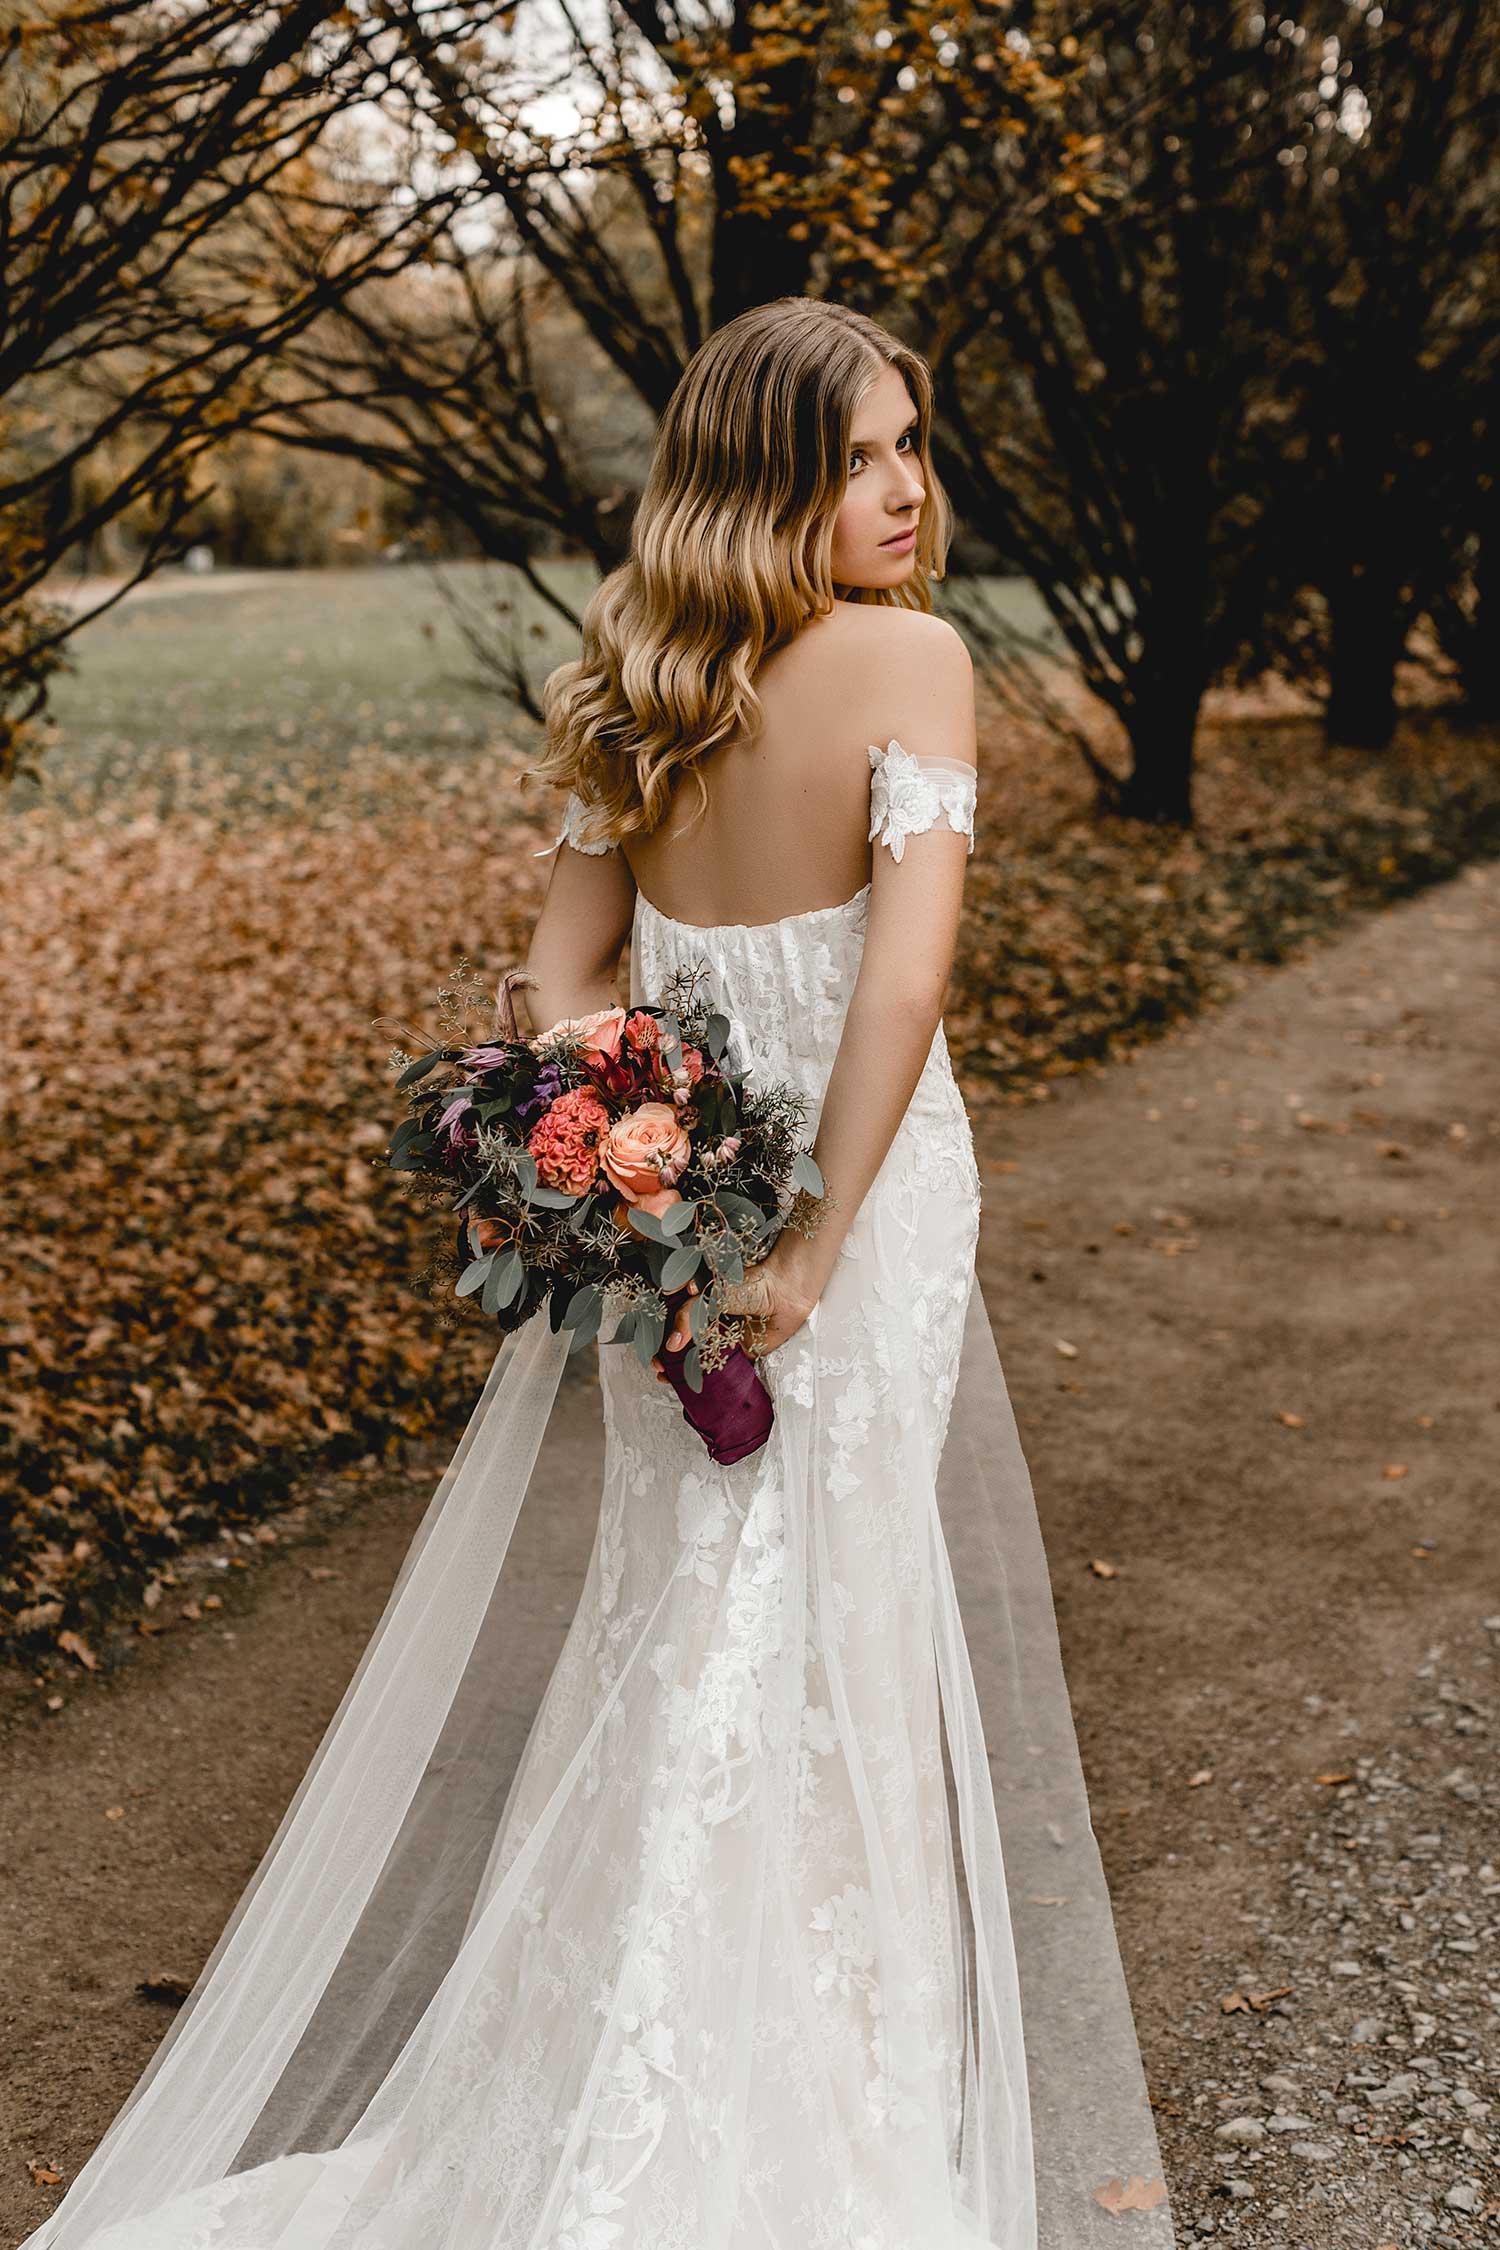 Bridal model posing in the park